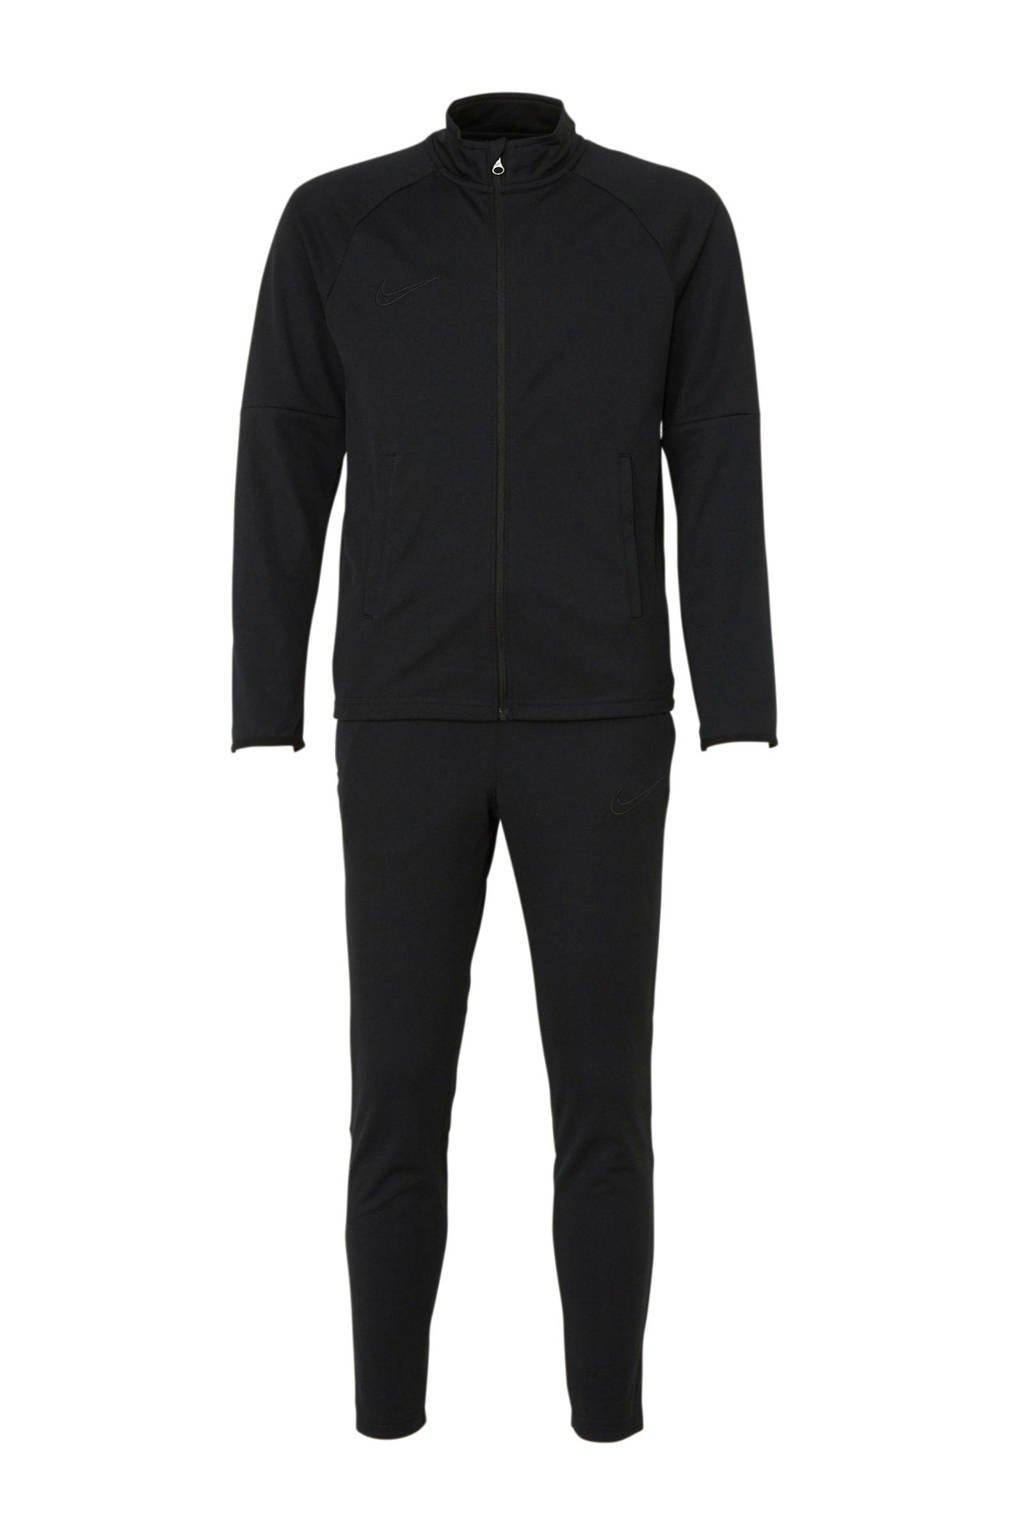 Nike Junior  trainingspak zwart, Zwart